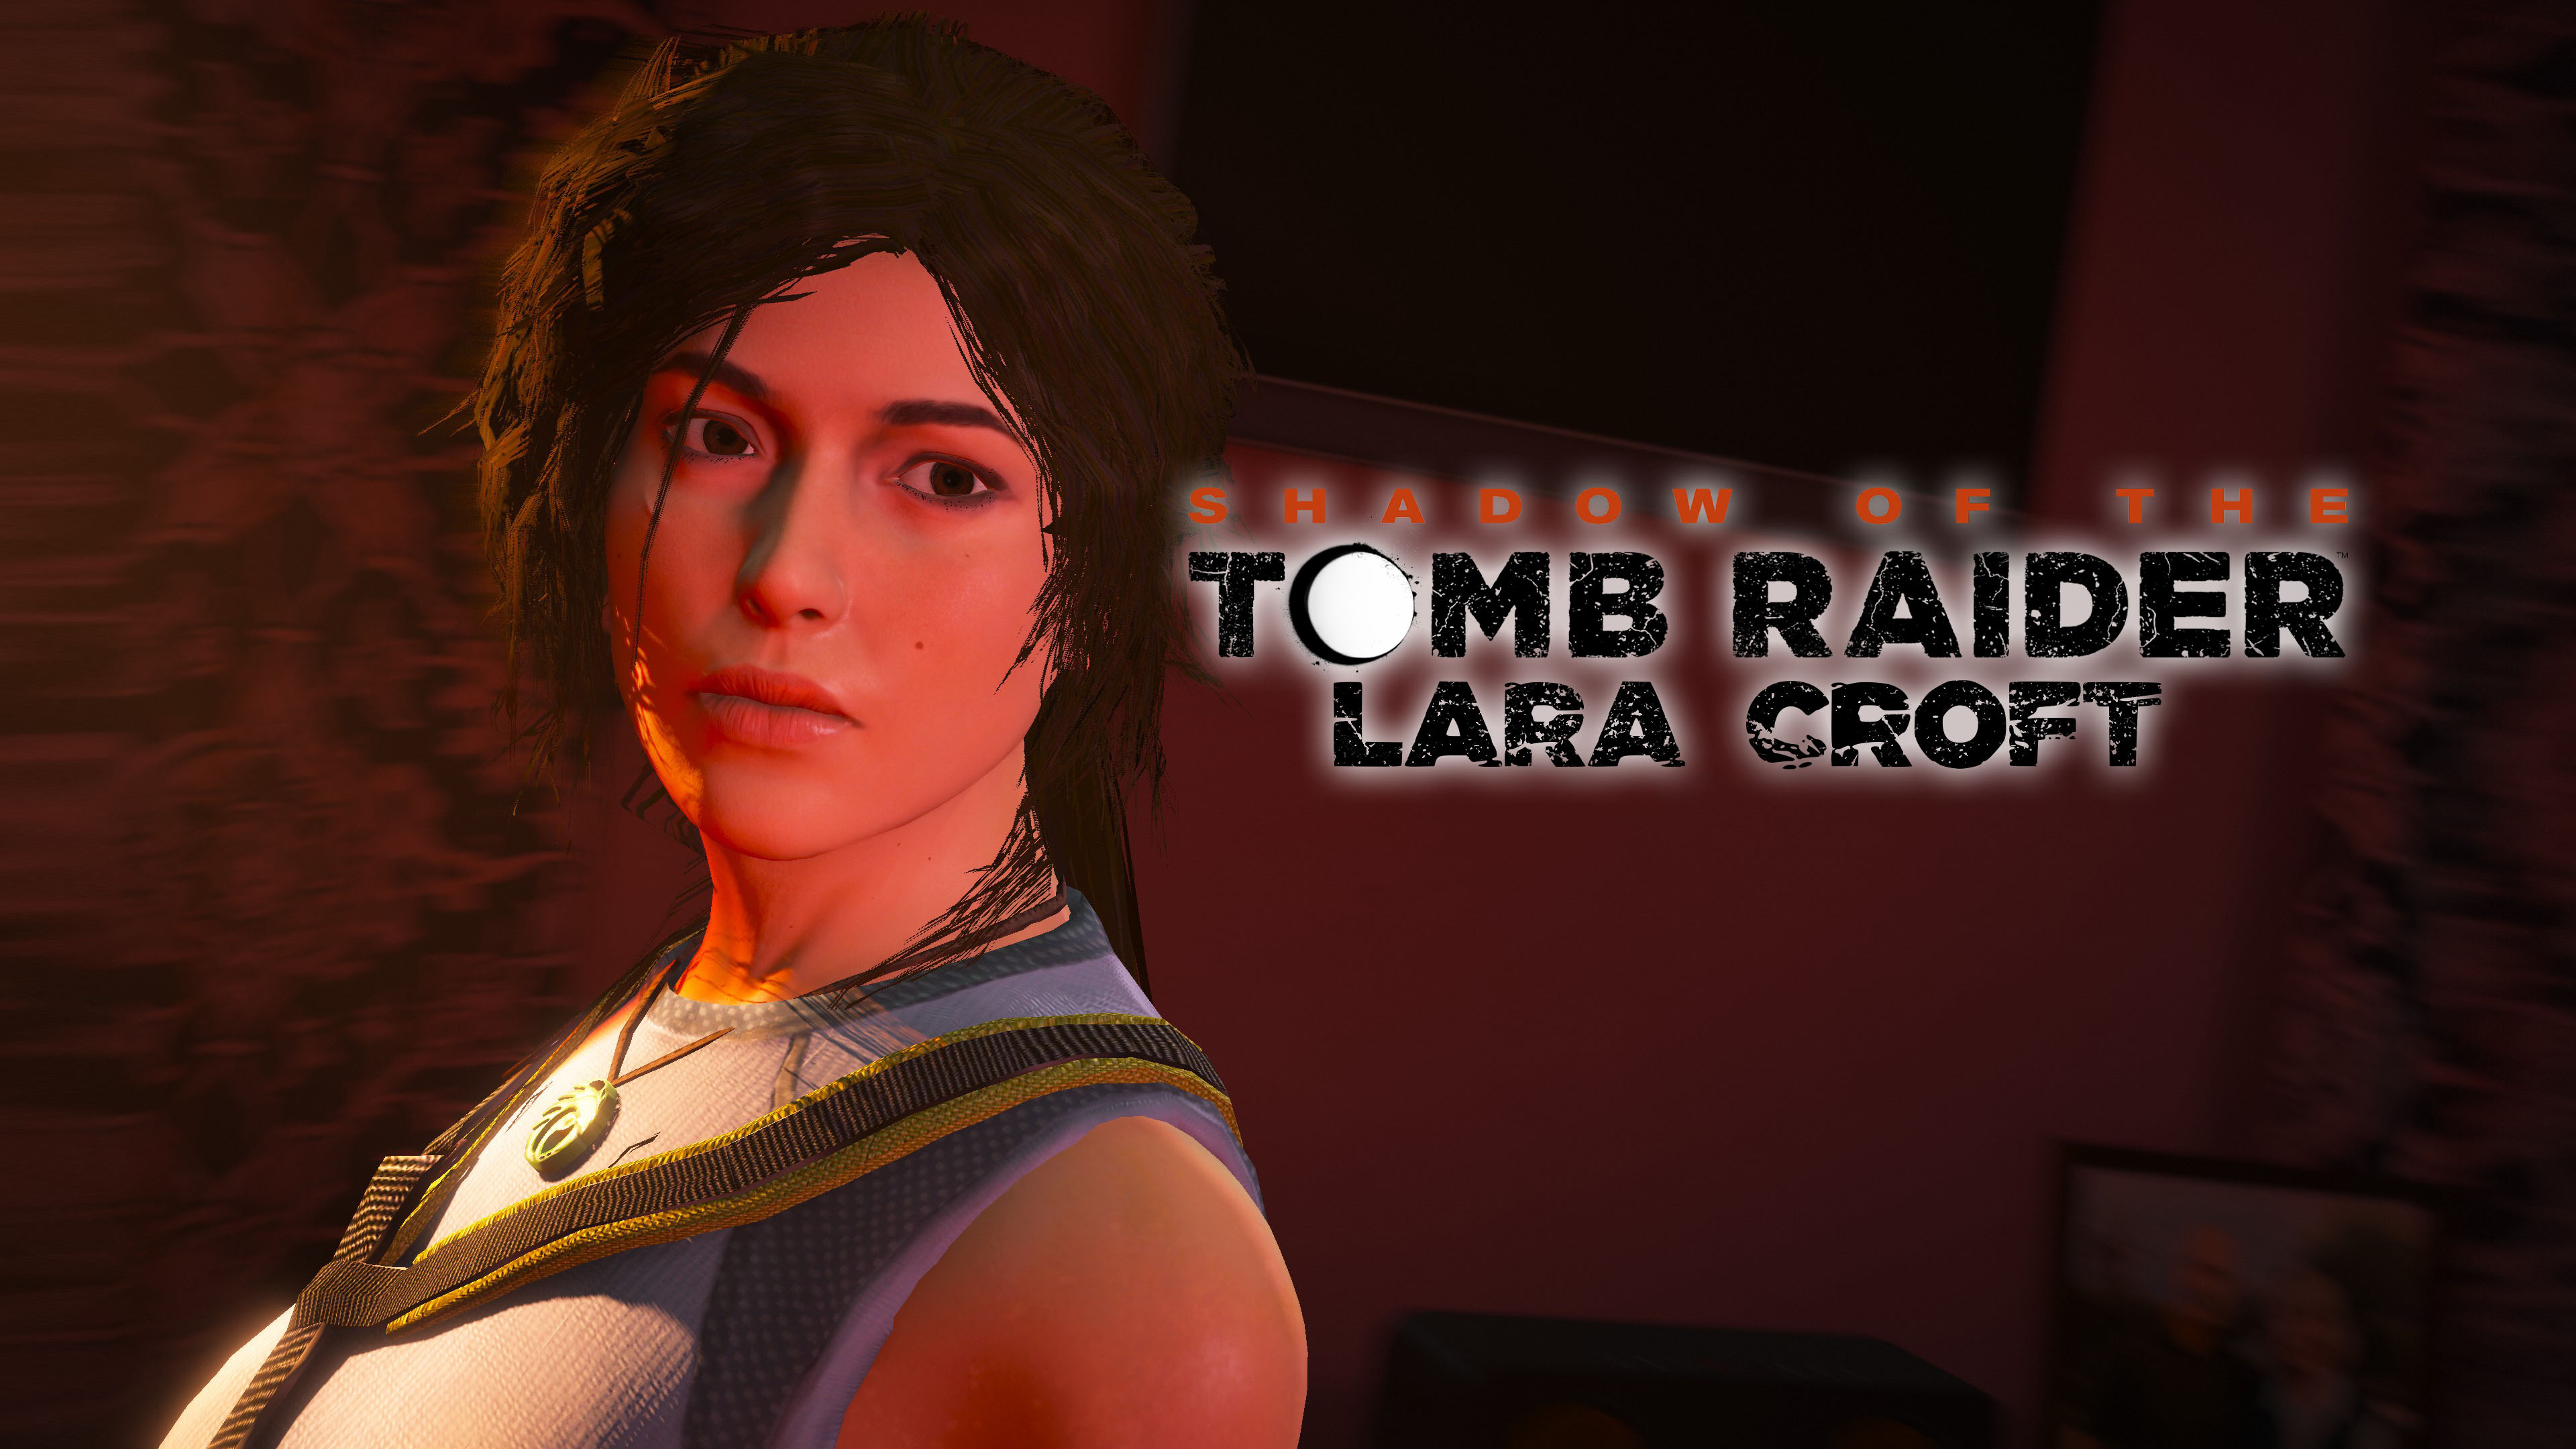 Shadow of The Tomb Raider: Lara Croft v2 (w/ Hair & Cloth Physics